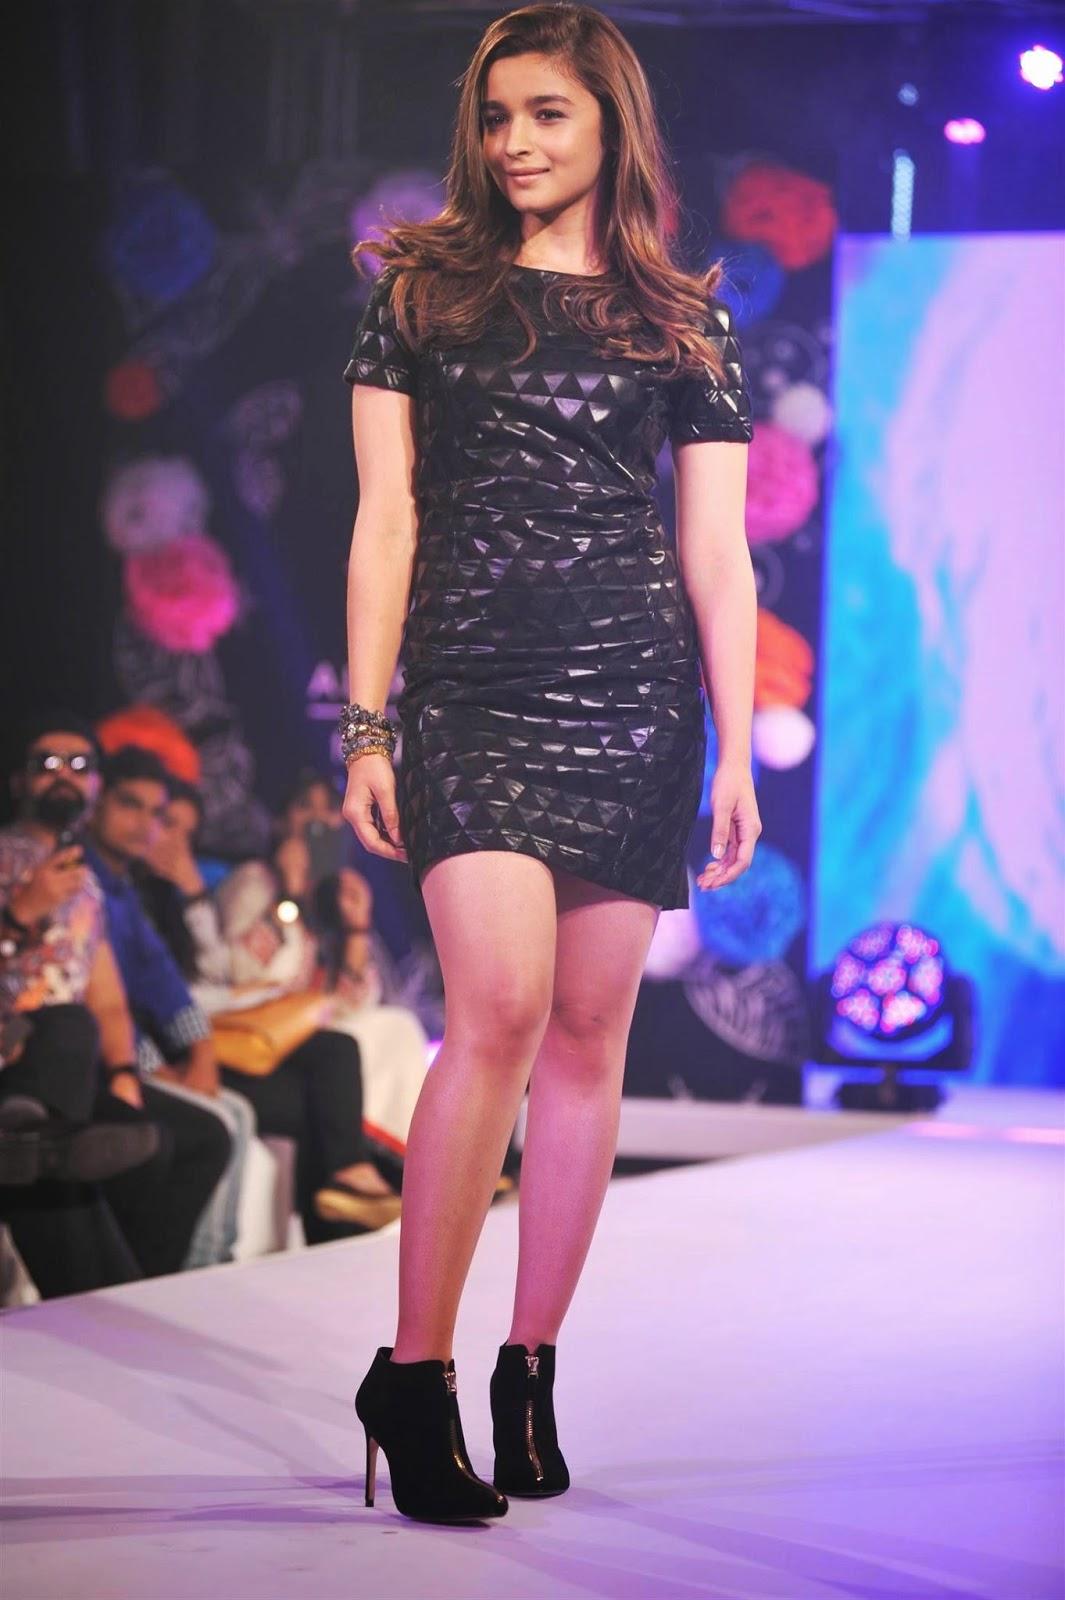 Alia Bhatt Unveiled The 'Alia Bhatt for Jabong' Collection